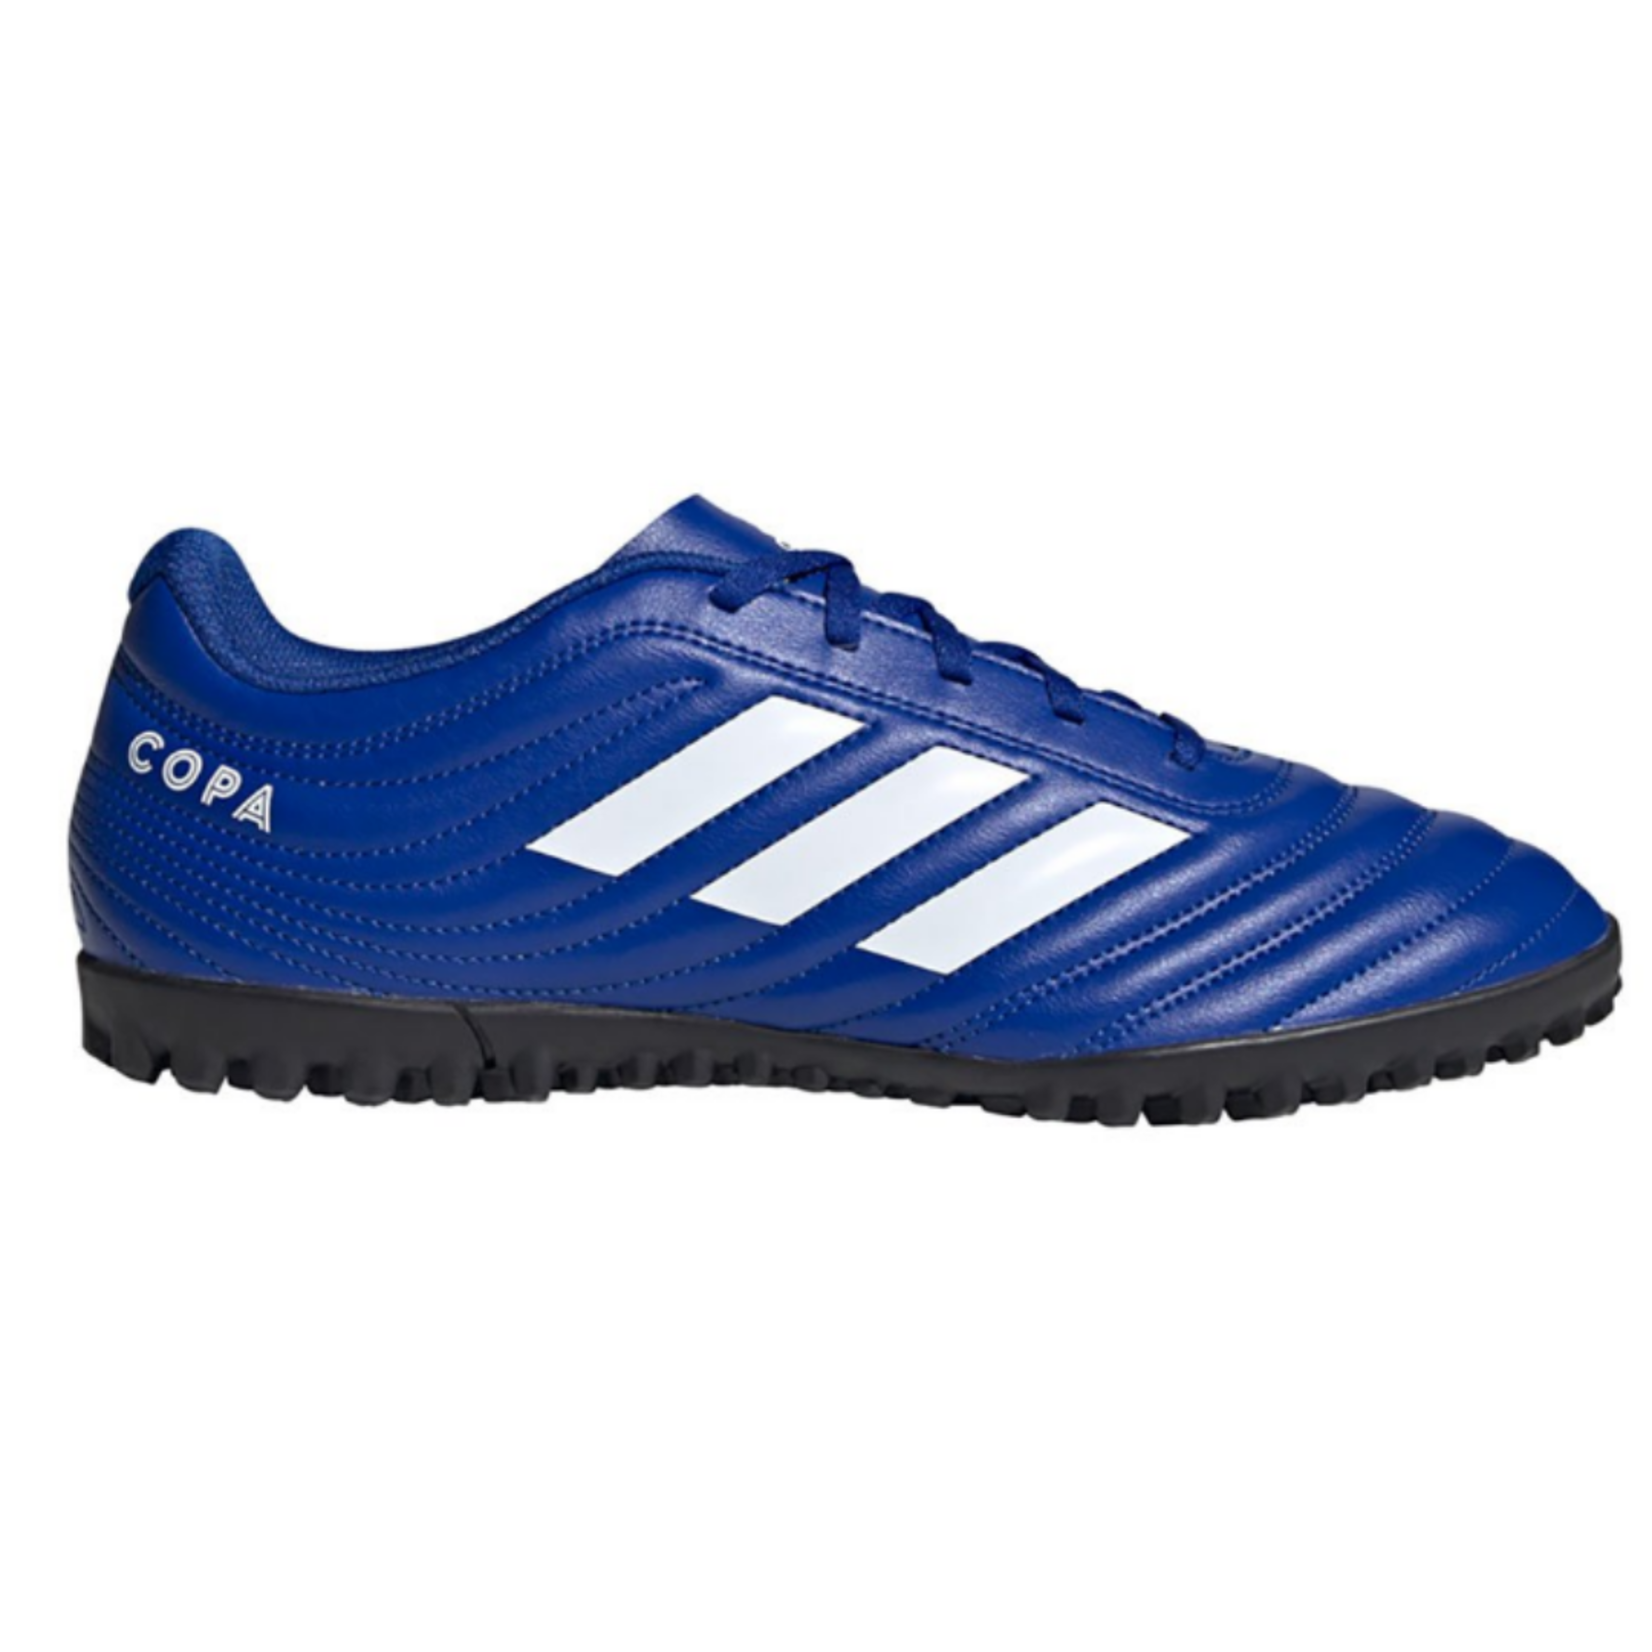 Adidas Adidas Copa 20.4 TF Soccer Cleat